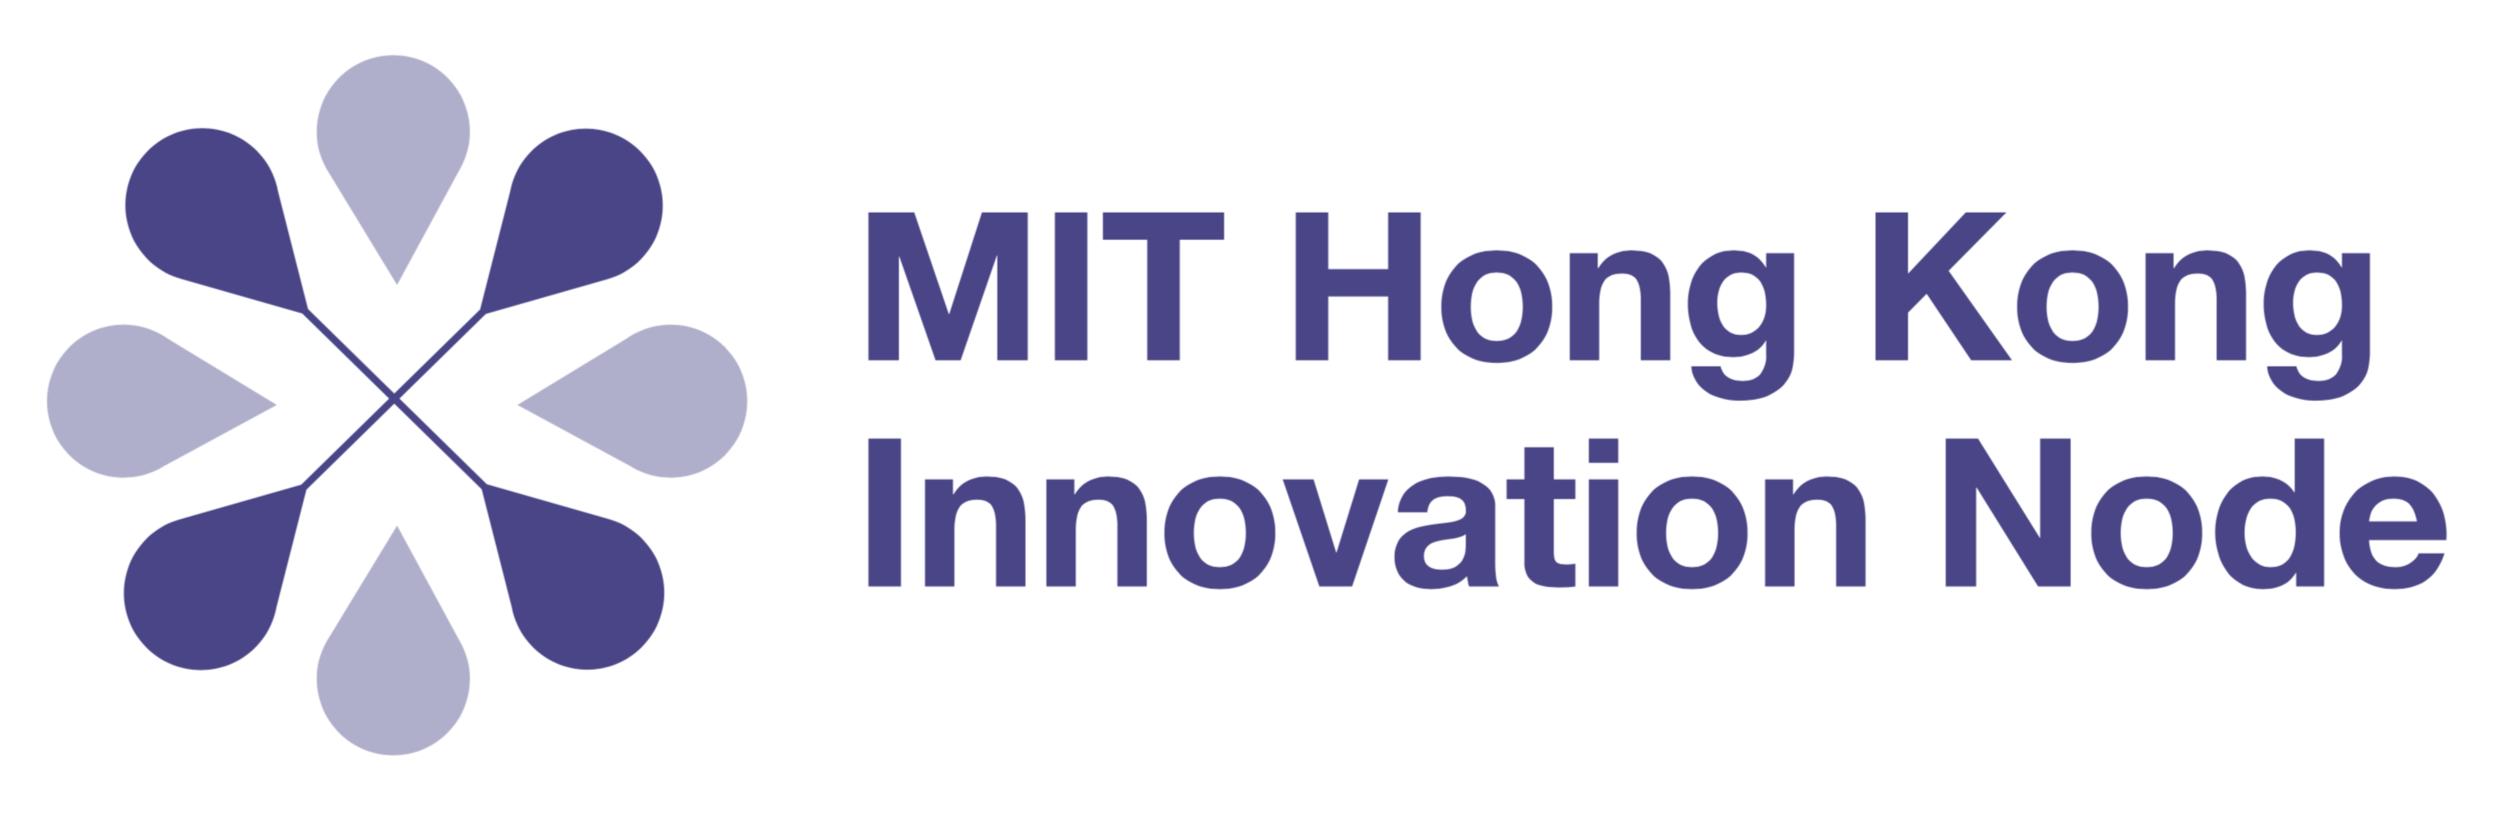 MIT Hong Kong Innovation Node